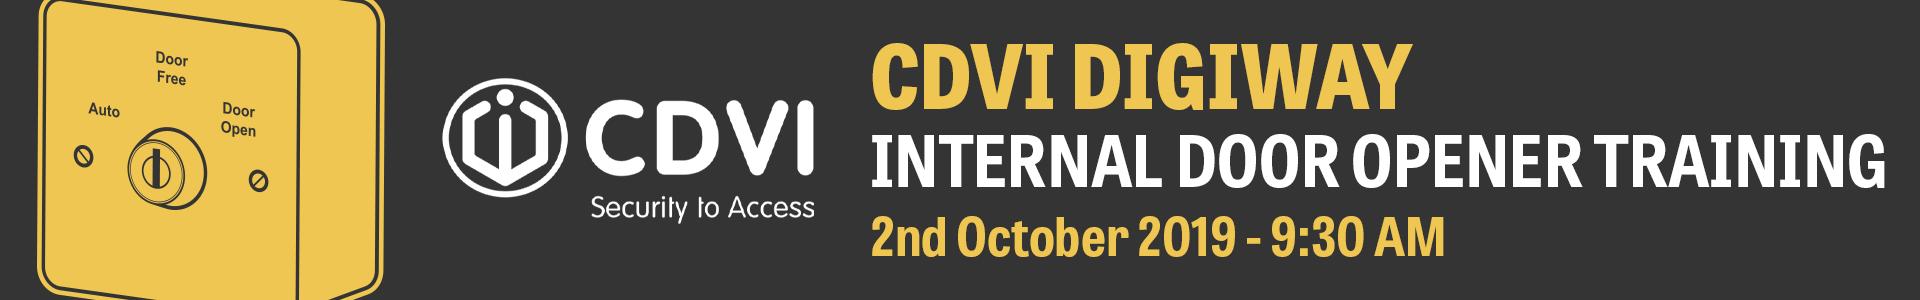 CDVI Training